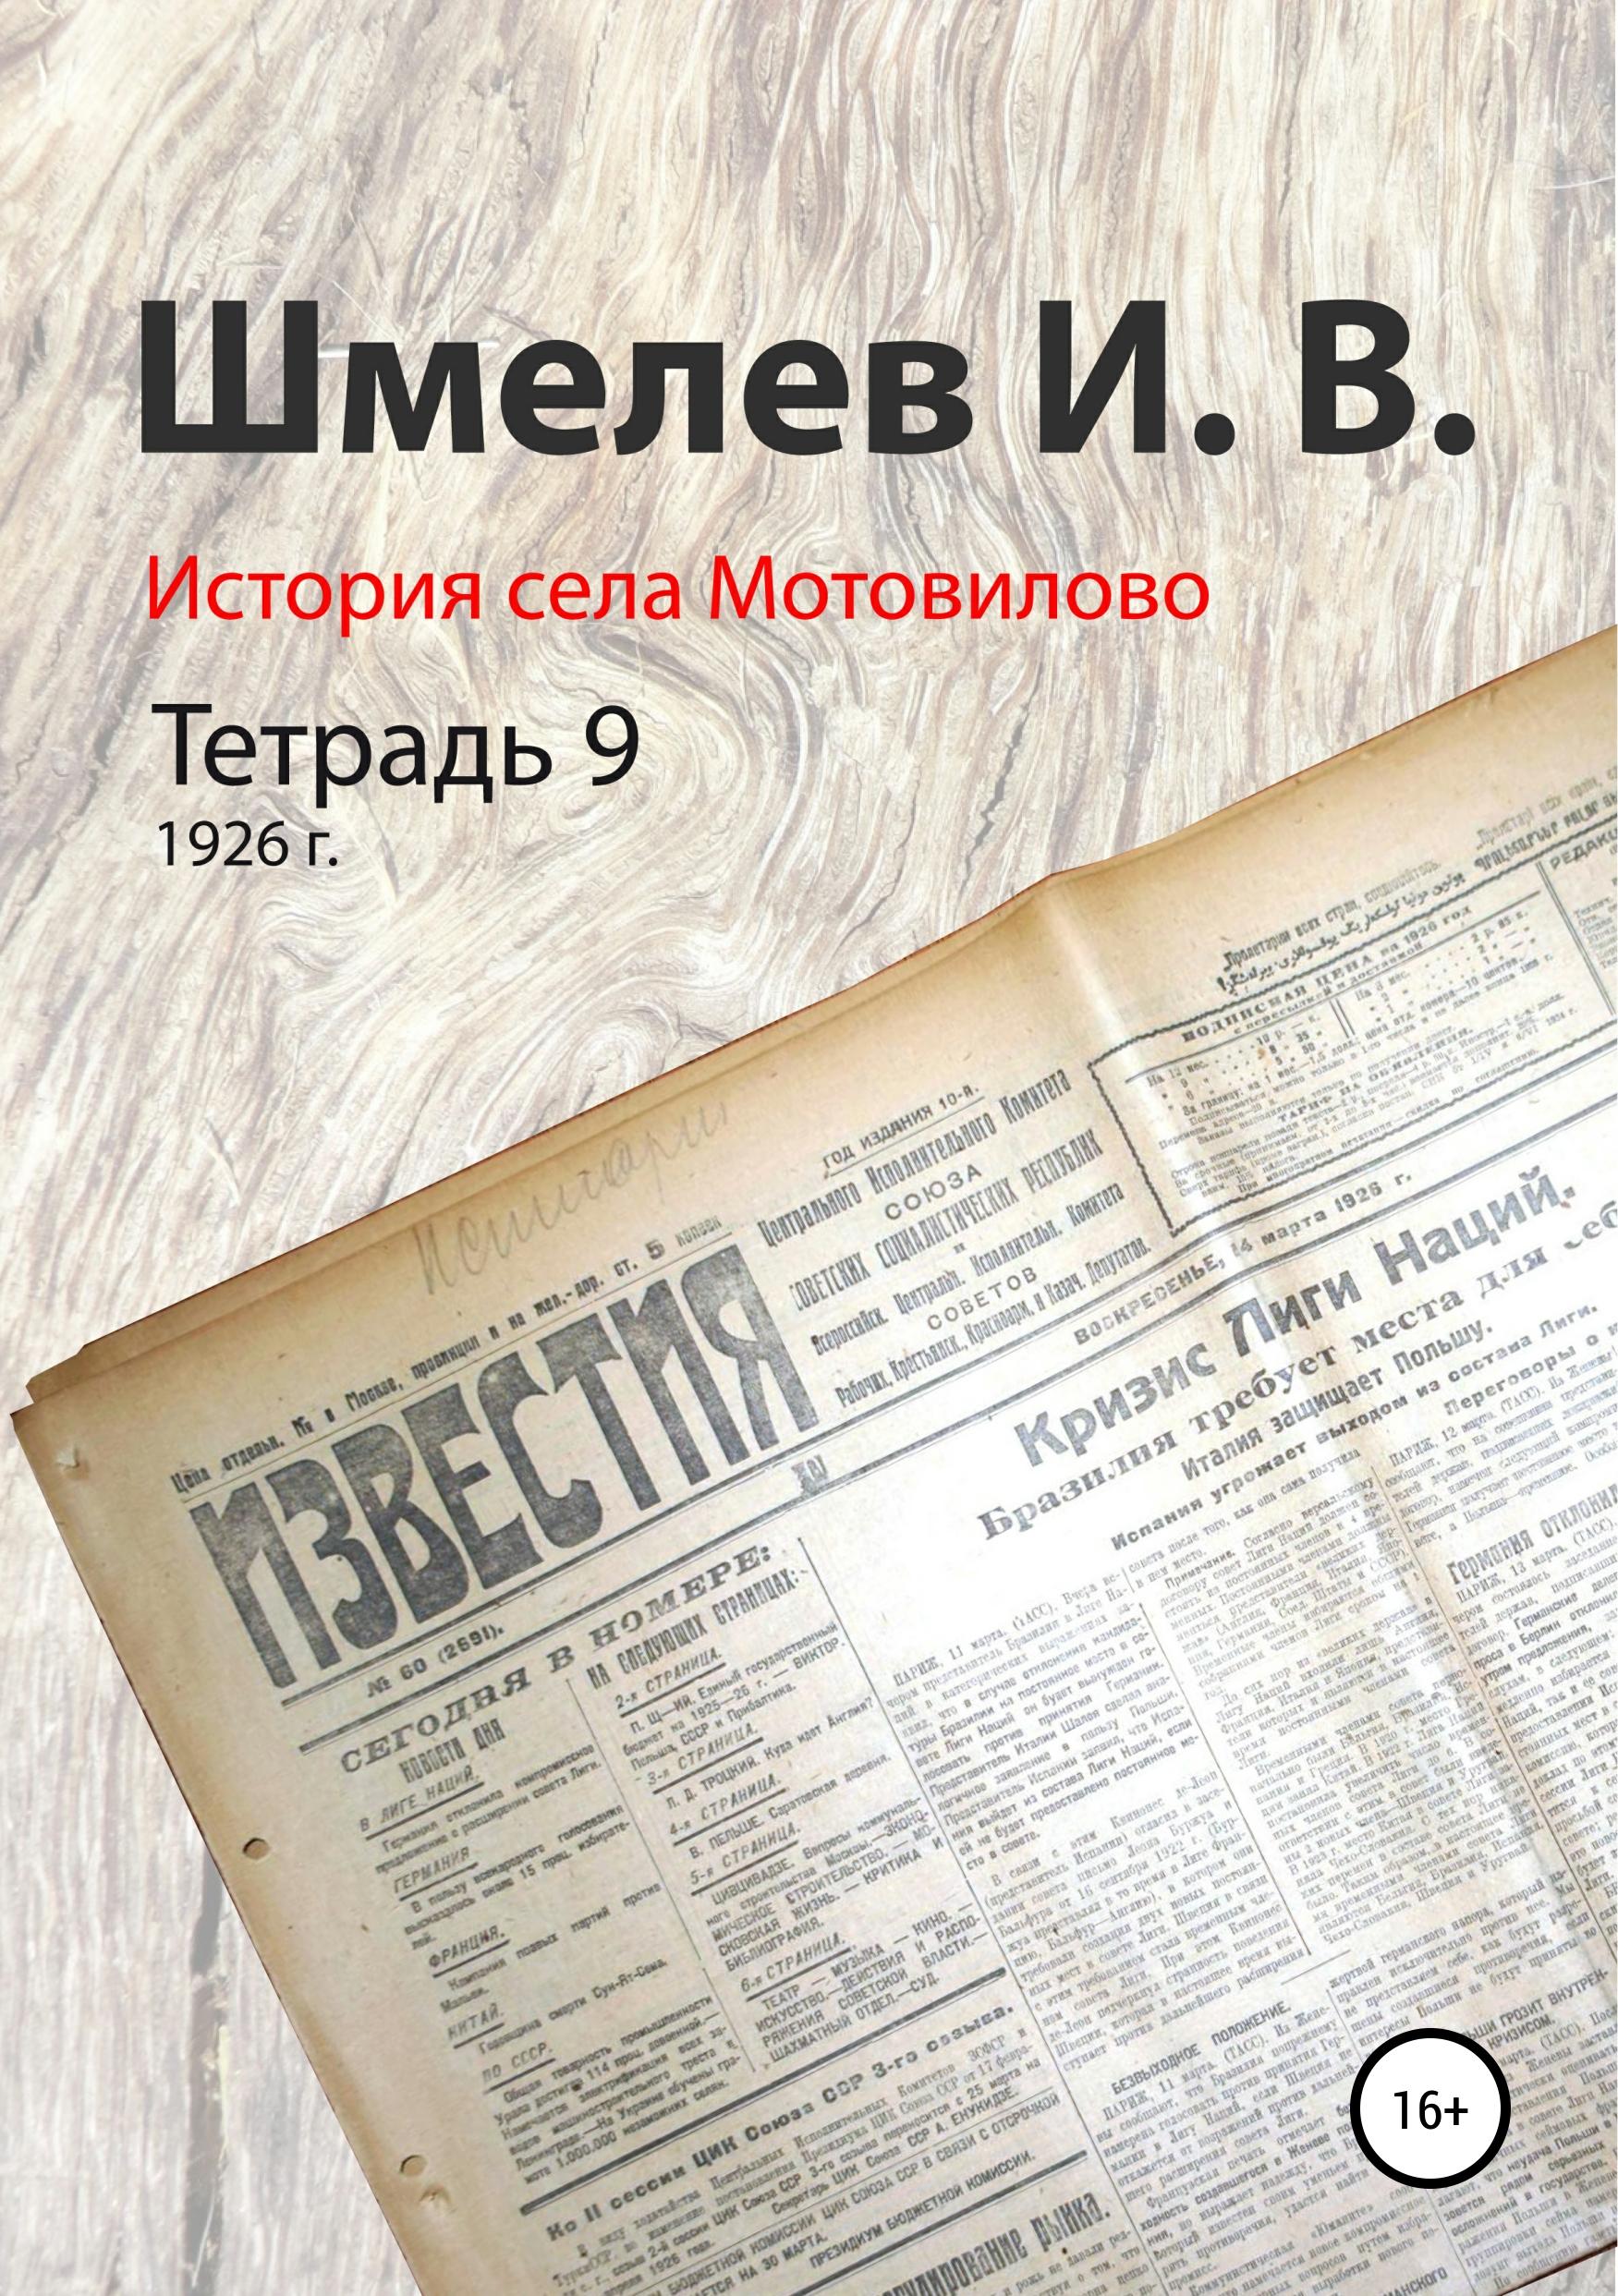 Иван Васильевич Шмелев История села Мотовилово. Тетрадь 9 (1926 г.) и с шмелев мой марс